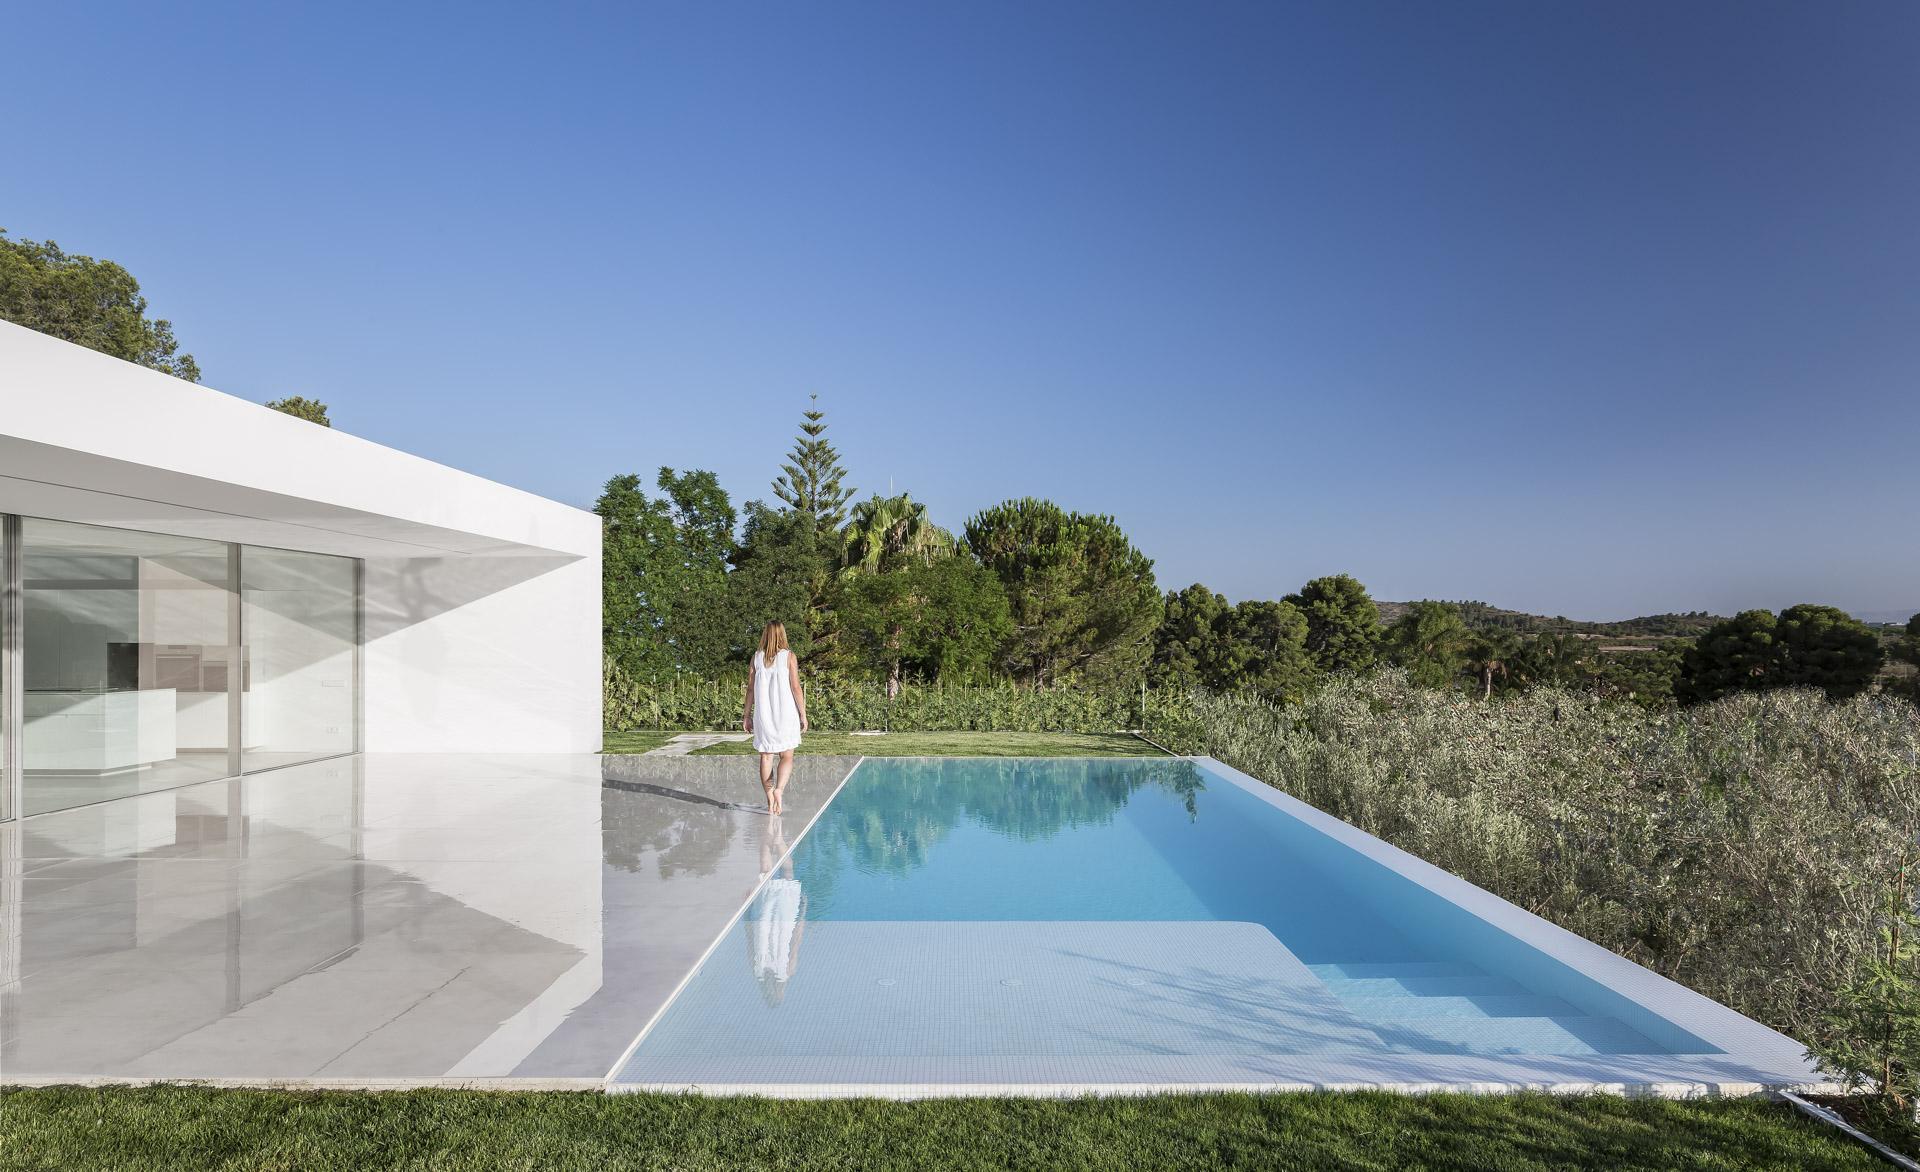 fotografia-arquitectura-valencia-german-cabo-gallardo-llopis-villamarchante-vivienda-35